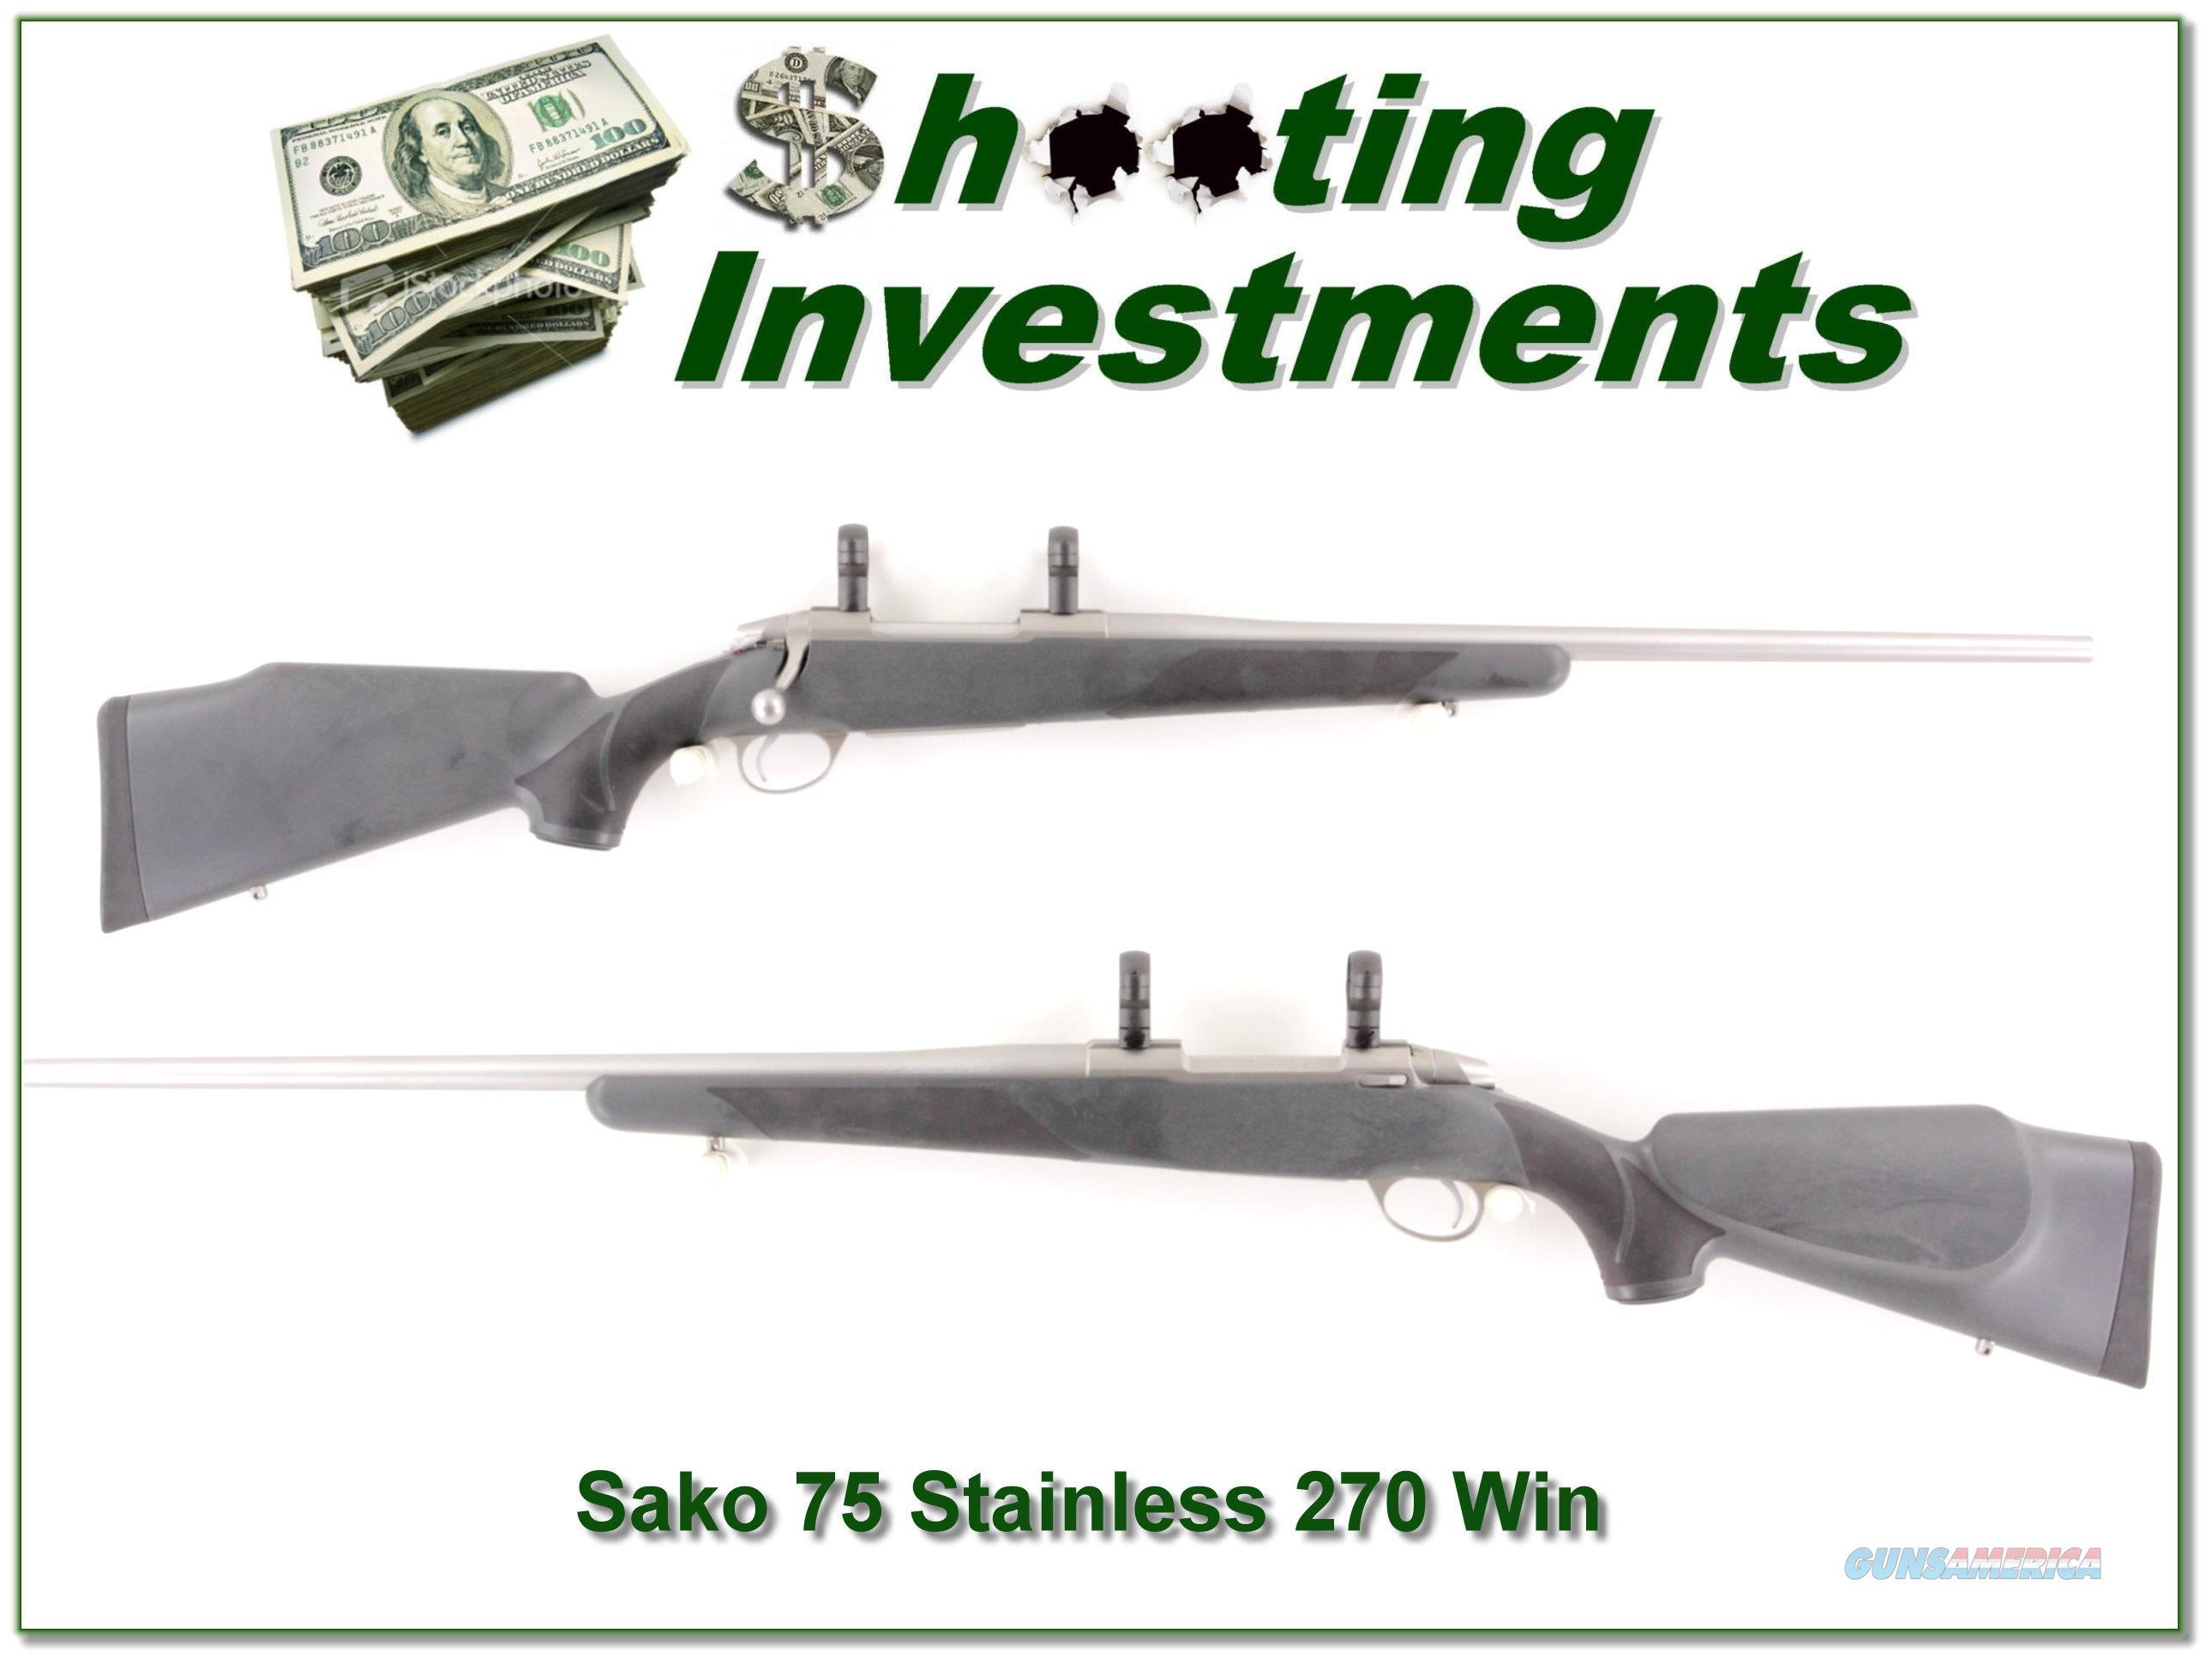 Sako 75 All-Weather Stainless 270 Win Exc Cond  Guns > Rifles > Sako Rifles > M75 Series